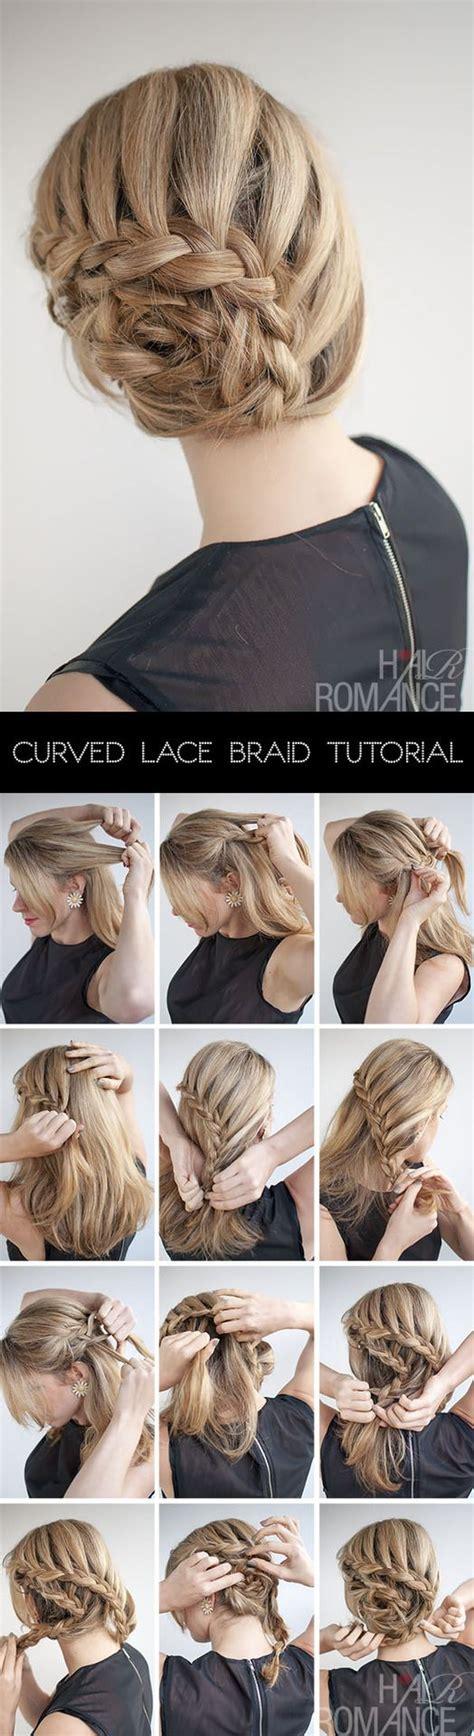 15 braided updo hairstyles tutorials 19 fabulous braided updo hairstyles with tutorials